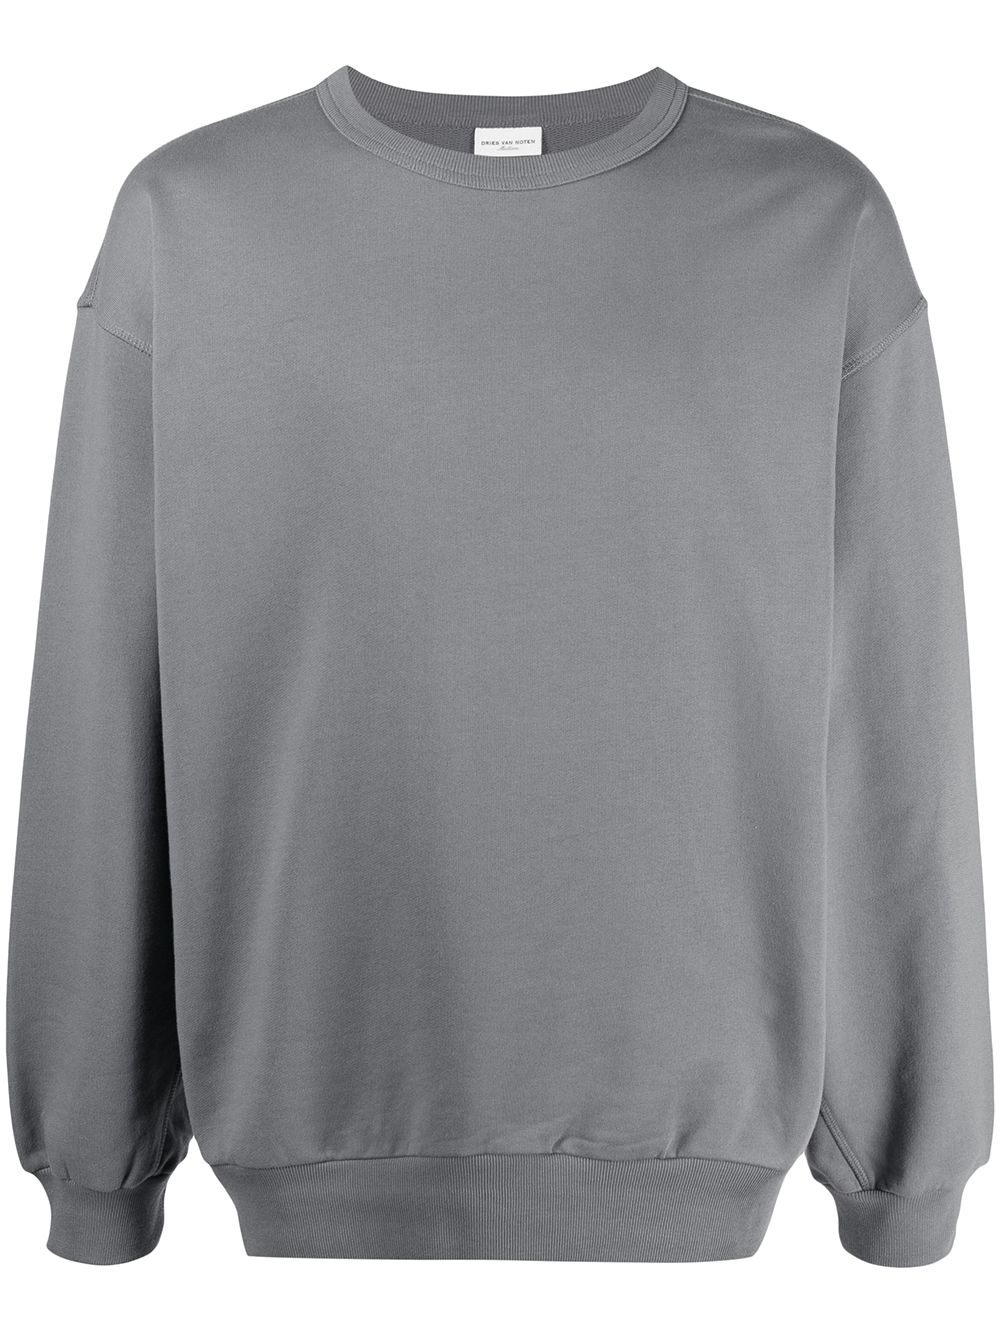 LONG SLEEVE SHIRT DRIES VAN NOTEN   Sweatshirts   HAXTI2609GREY